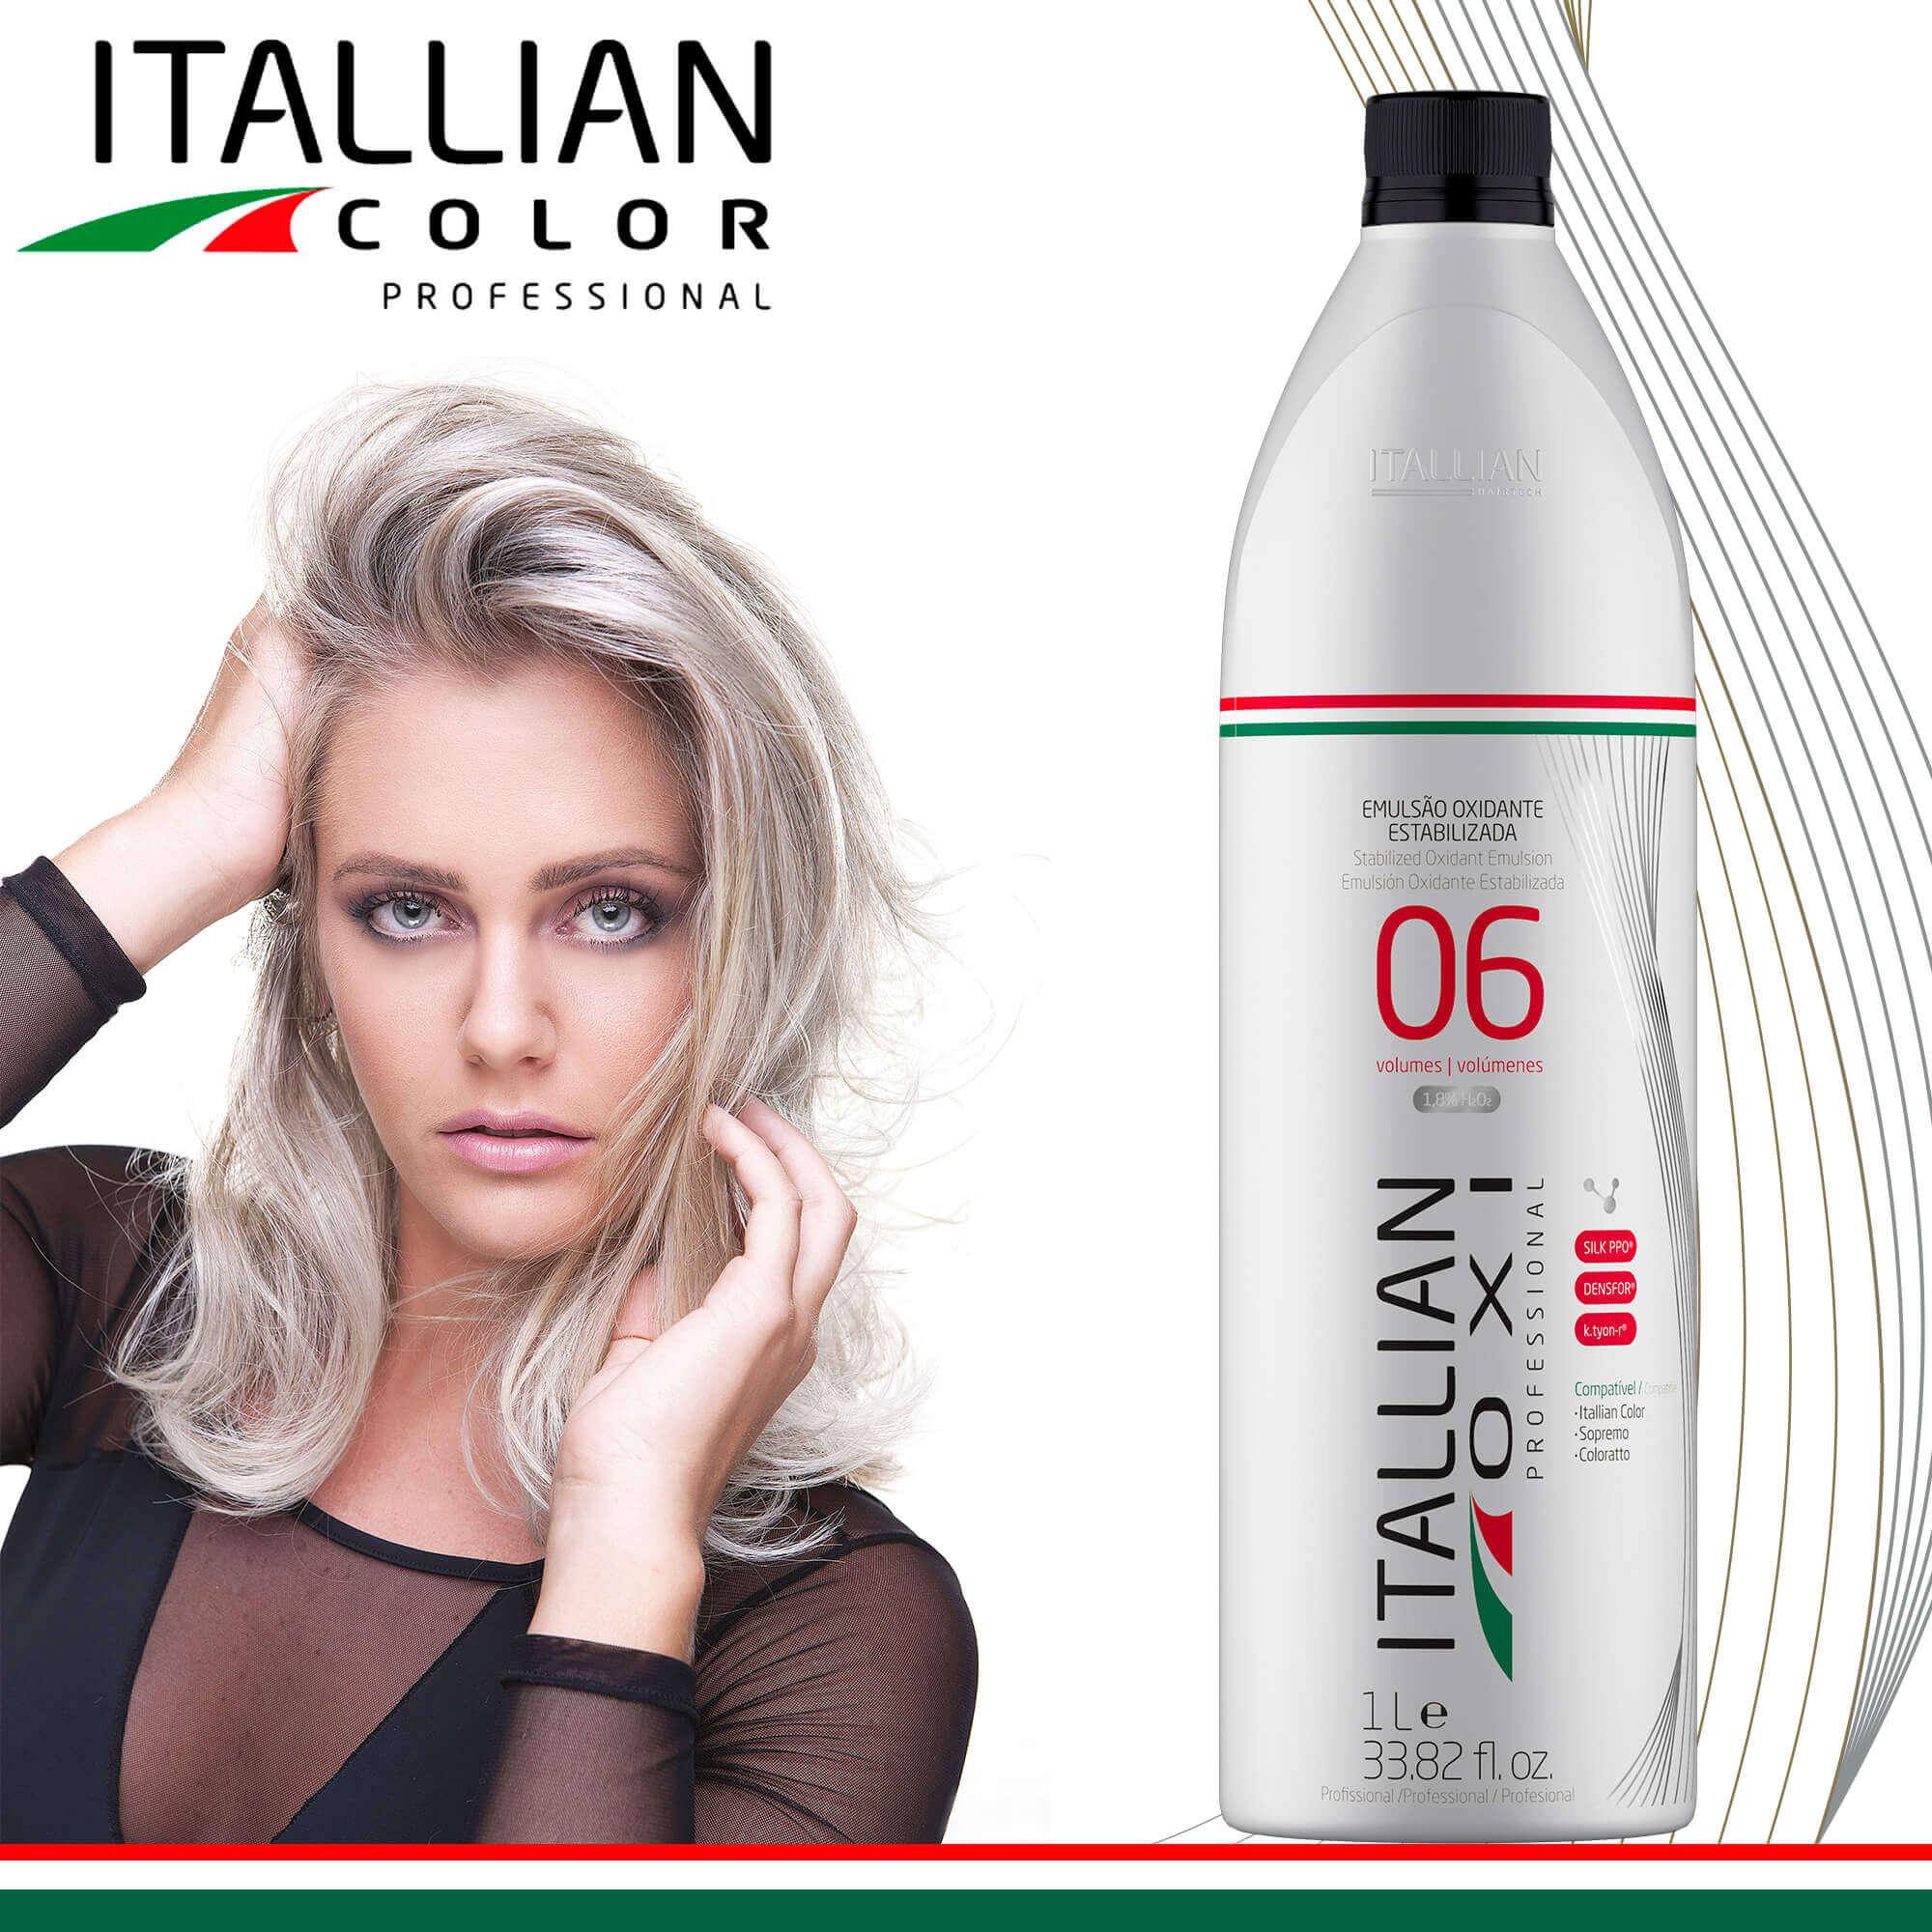 Emulsão Oxidante Estabilizada Itallian Oxi 06 Volumes 1l